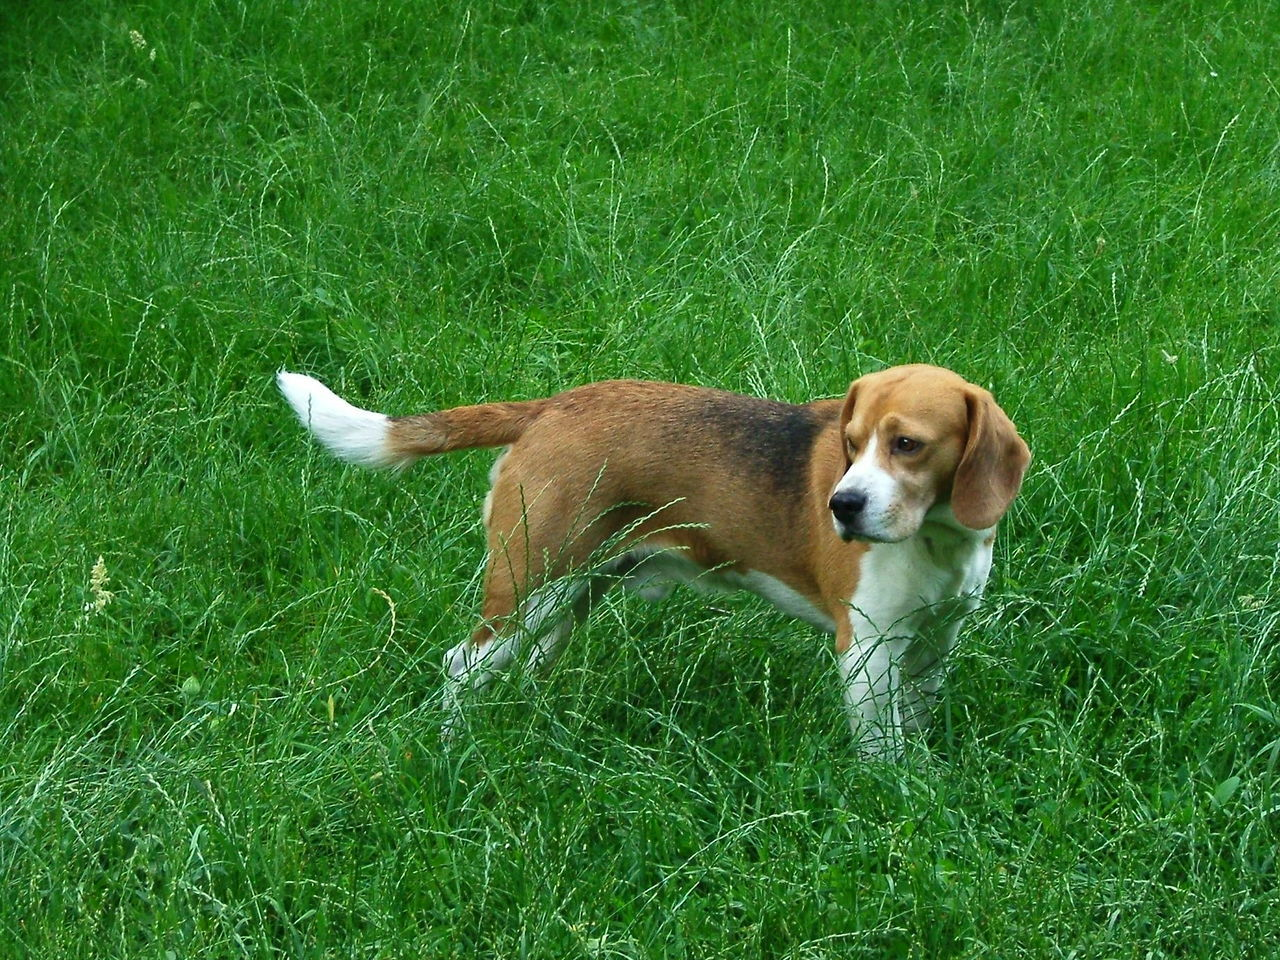 Animal Beagle Beaglelove Beaglelovers Beagleoftheday Beagles  Betyár Dog Domestic Animals Mybeagle One Animal Pets Raskal